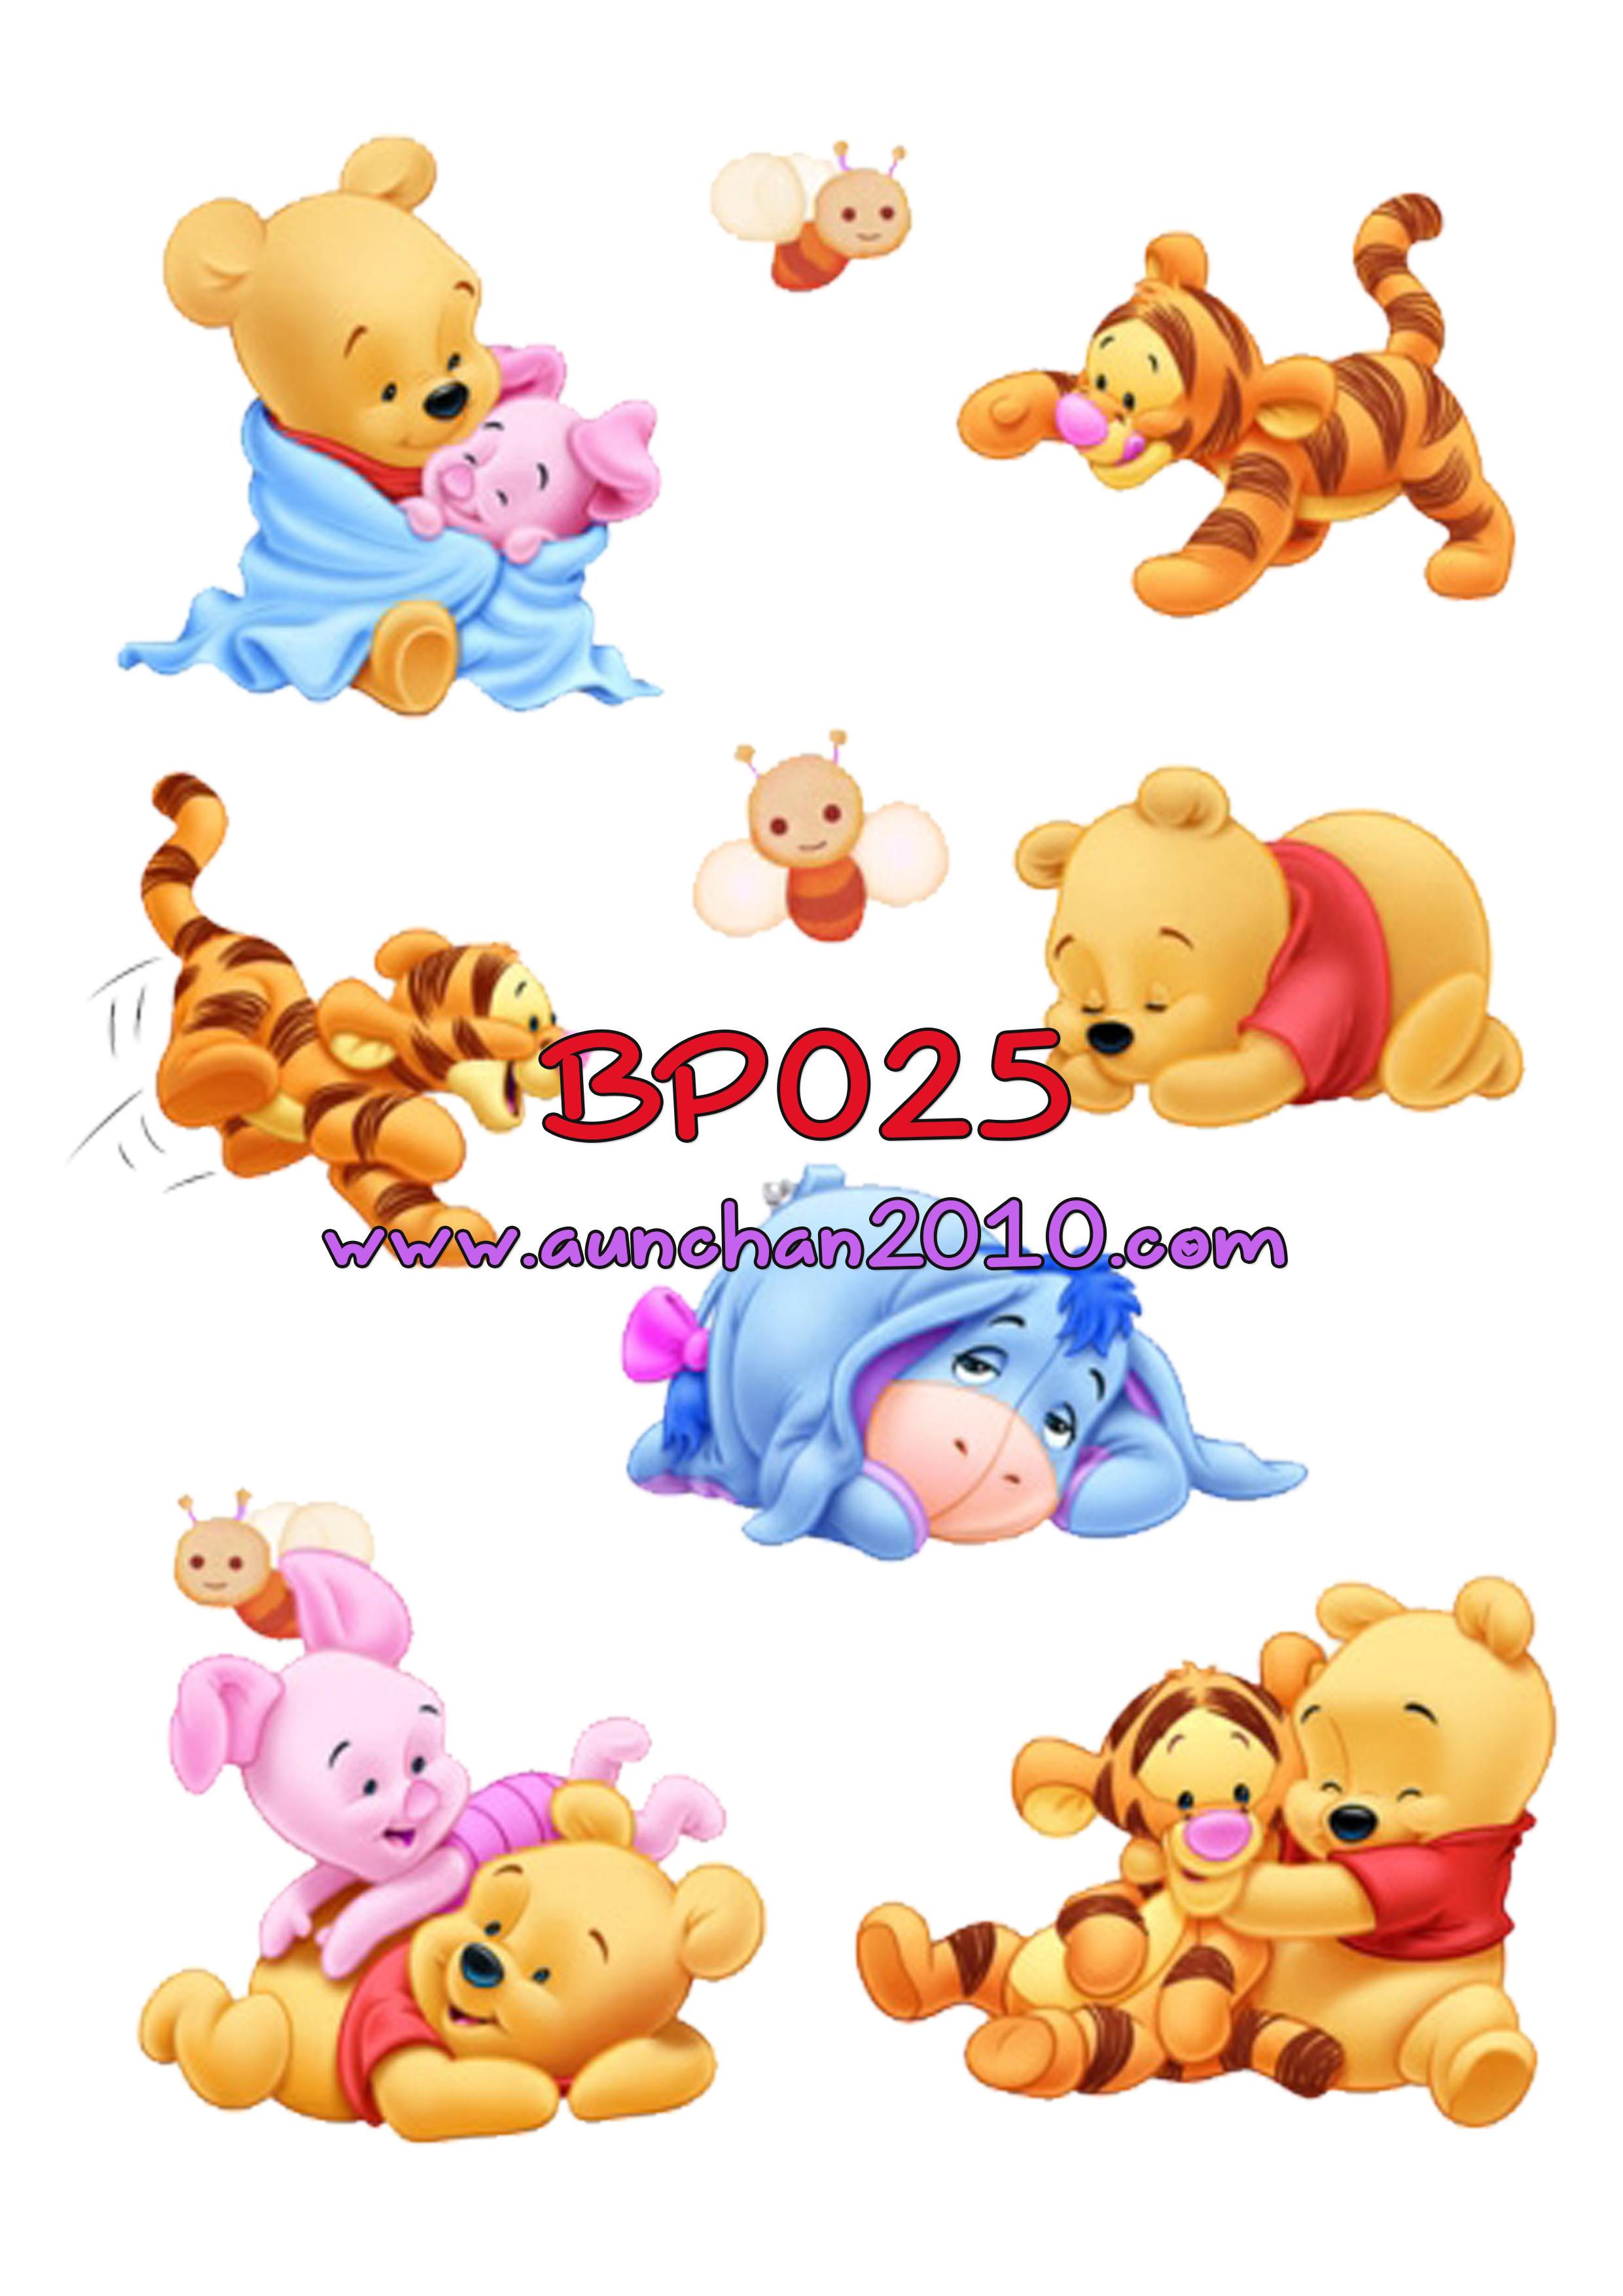 BP025 กระดาษแนพกิ้น 21x30ซม. ลายหมีพูห์